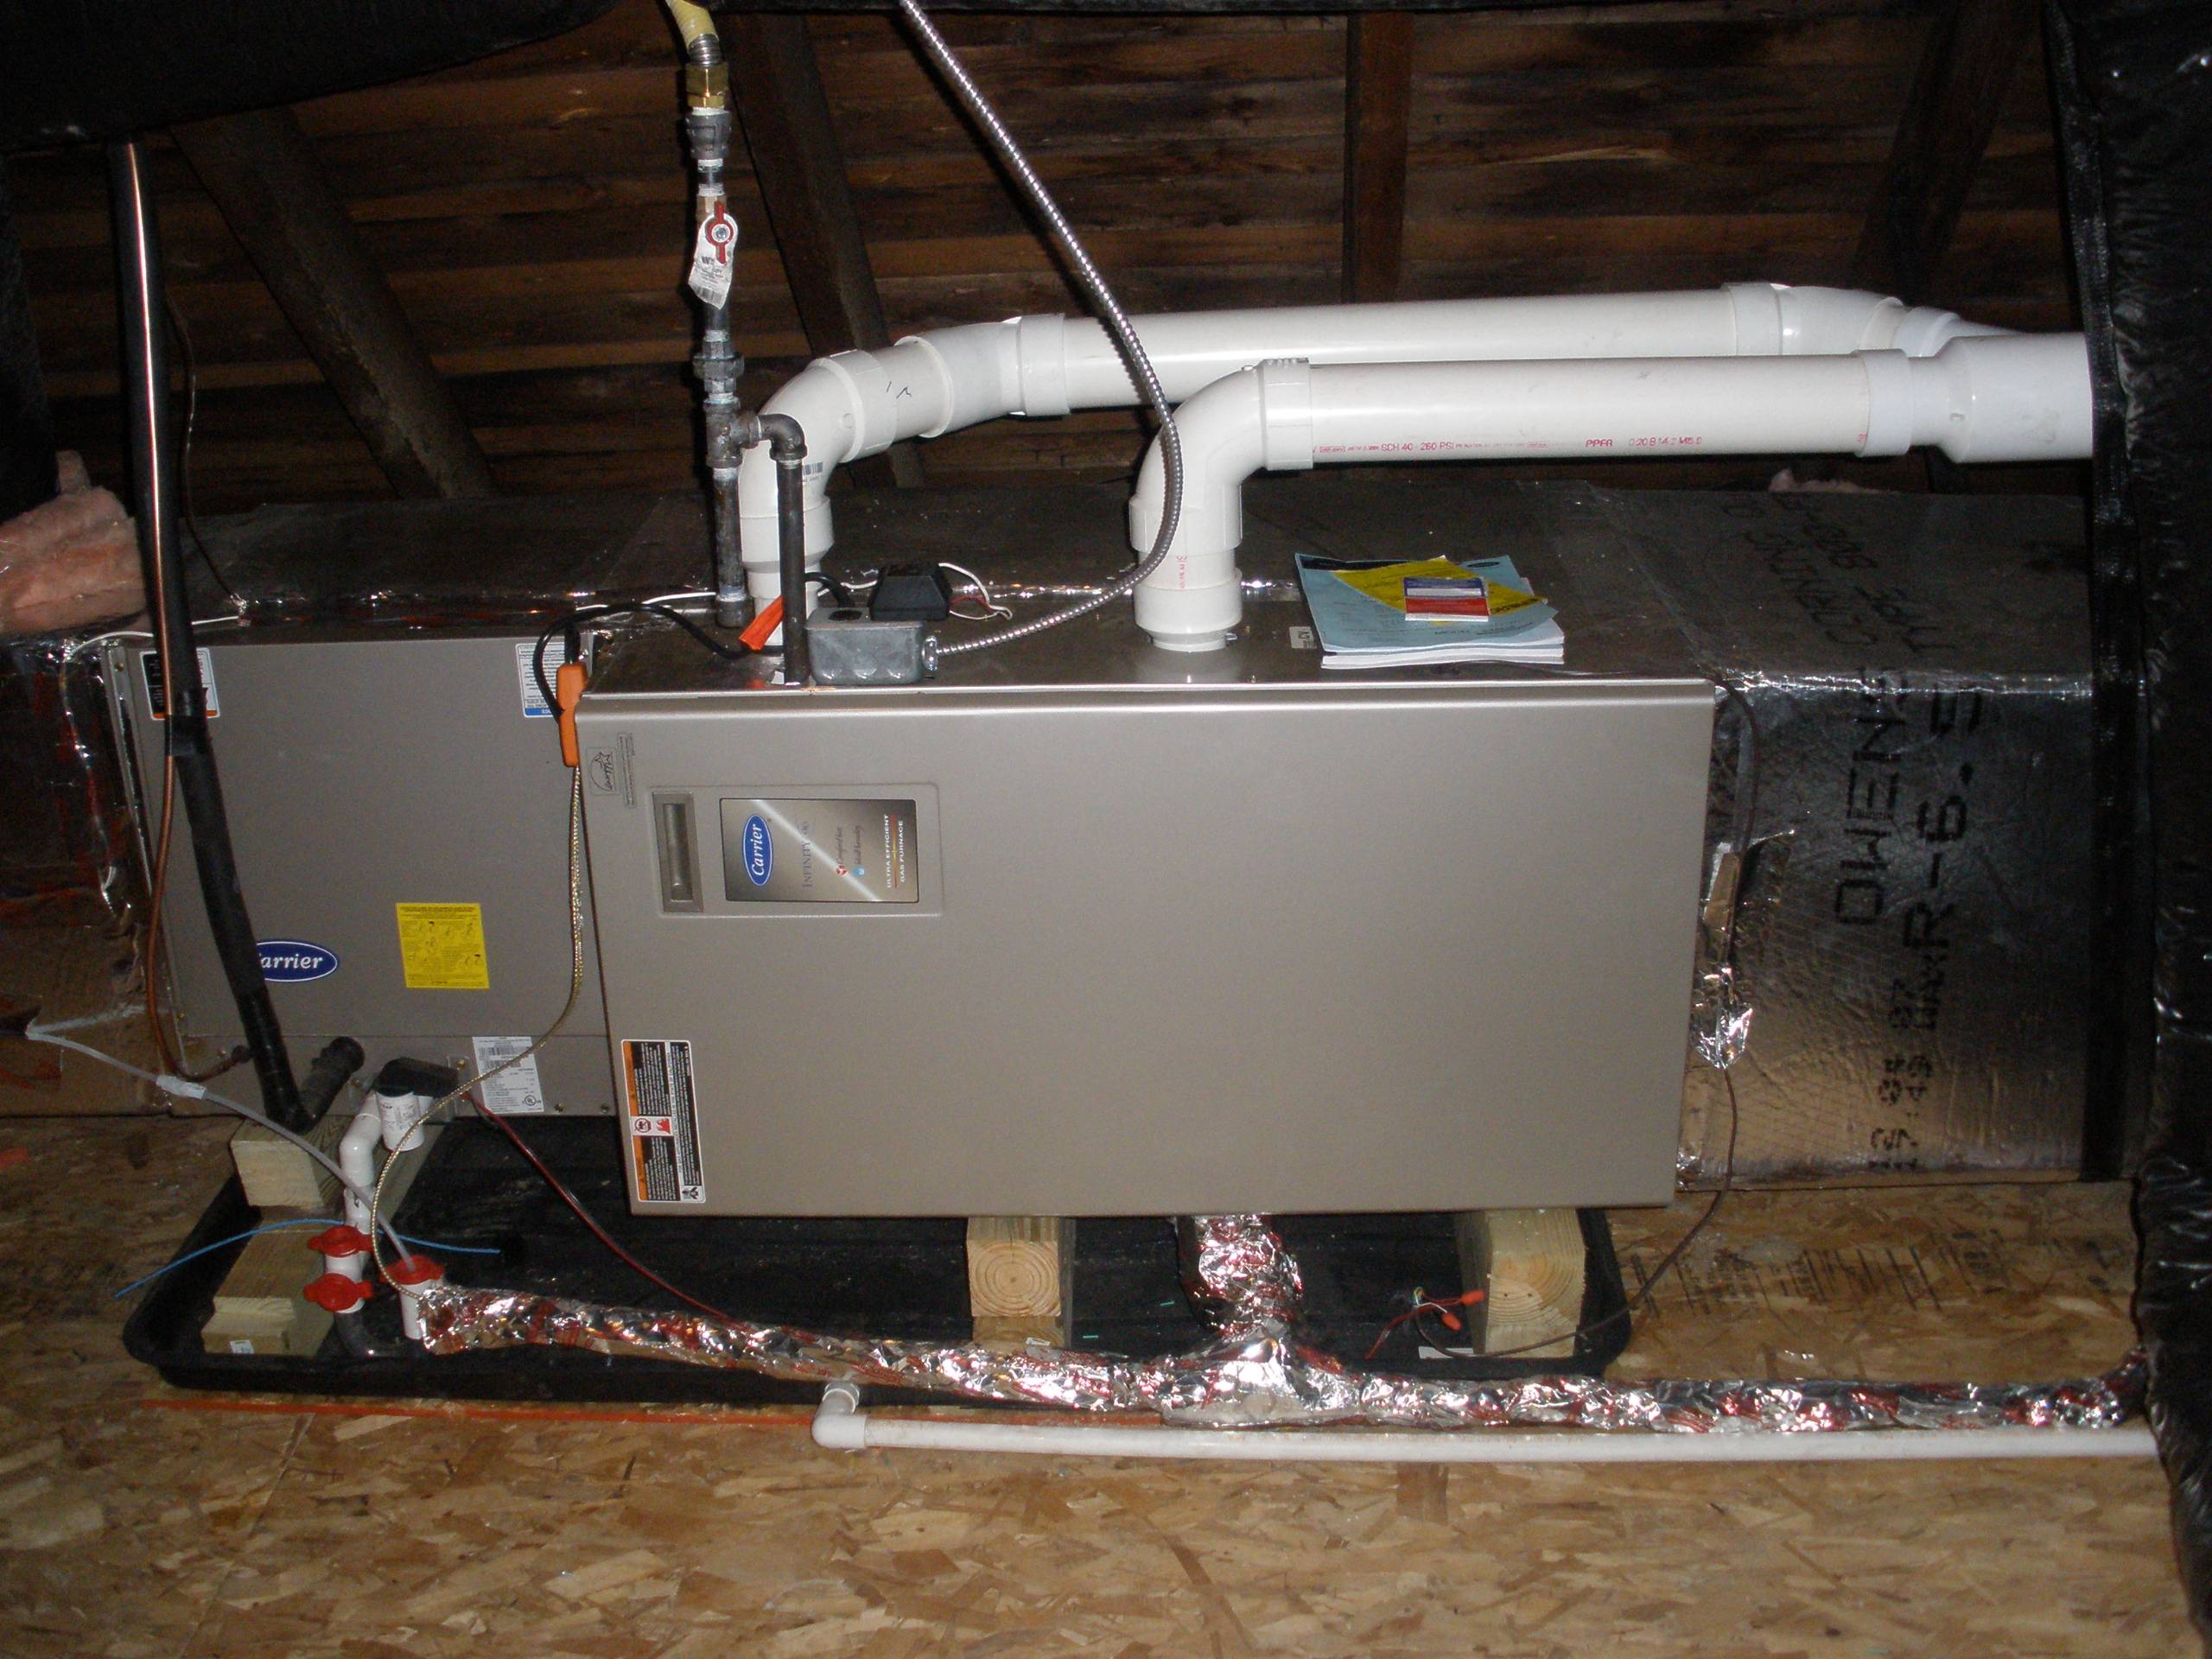 Furnace Installation in Attic